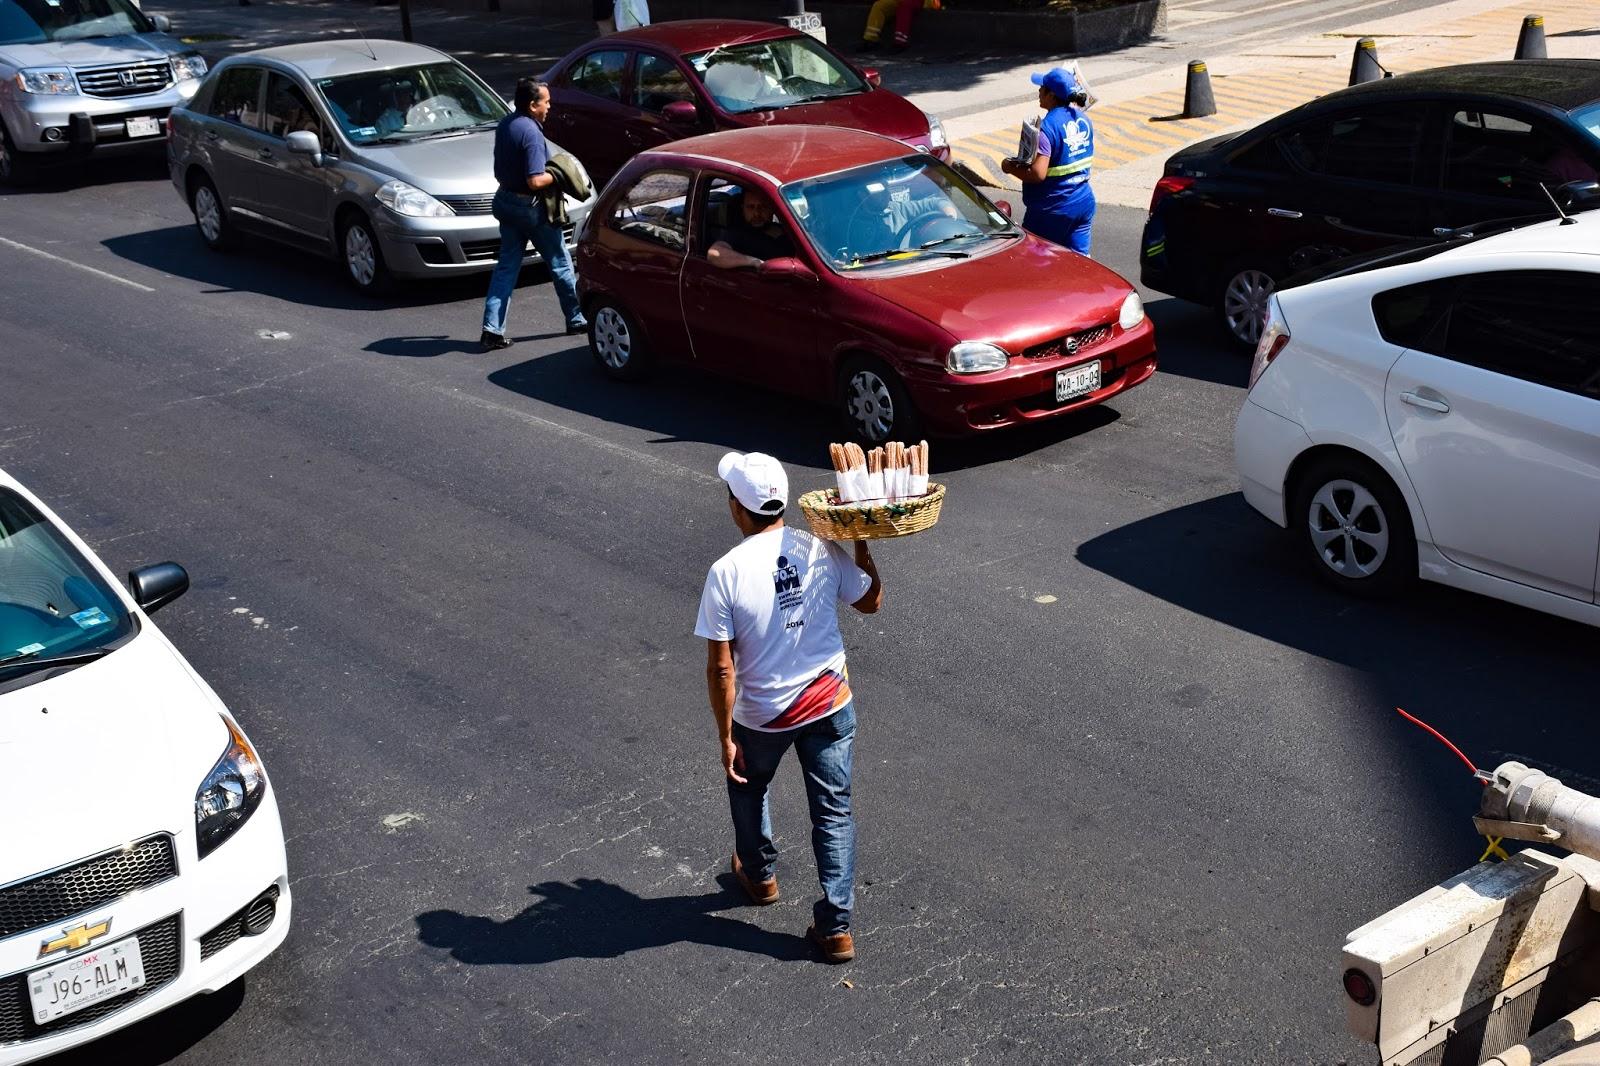 churro delivery man